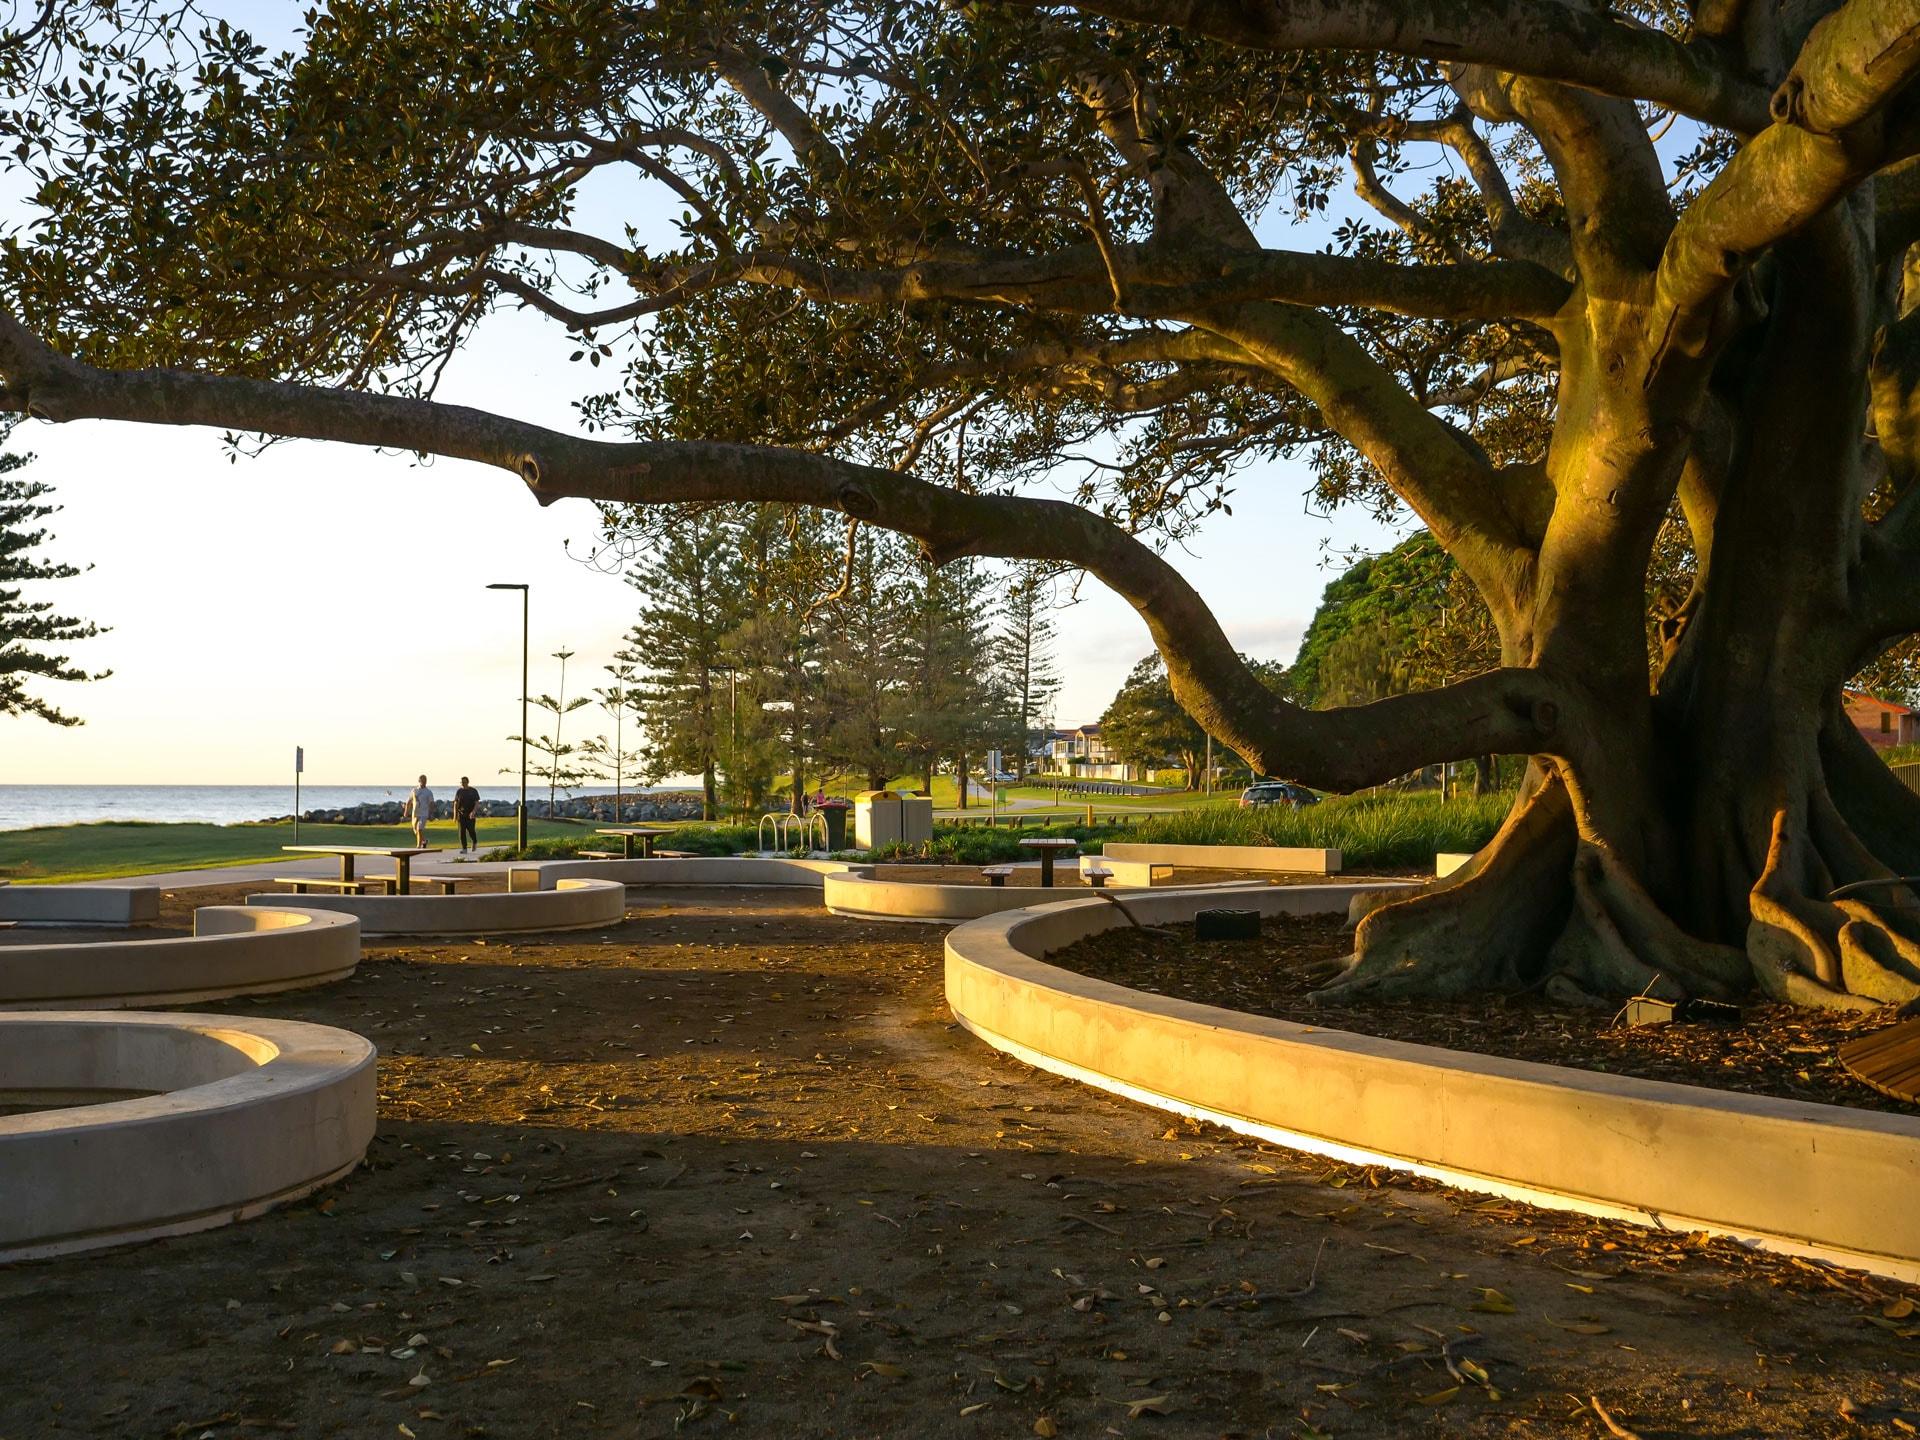 6.-Scarborough-Beach-Park-P1033809.jpg